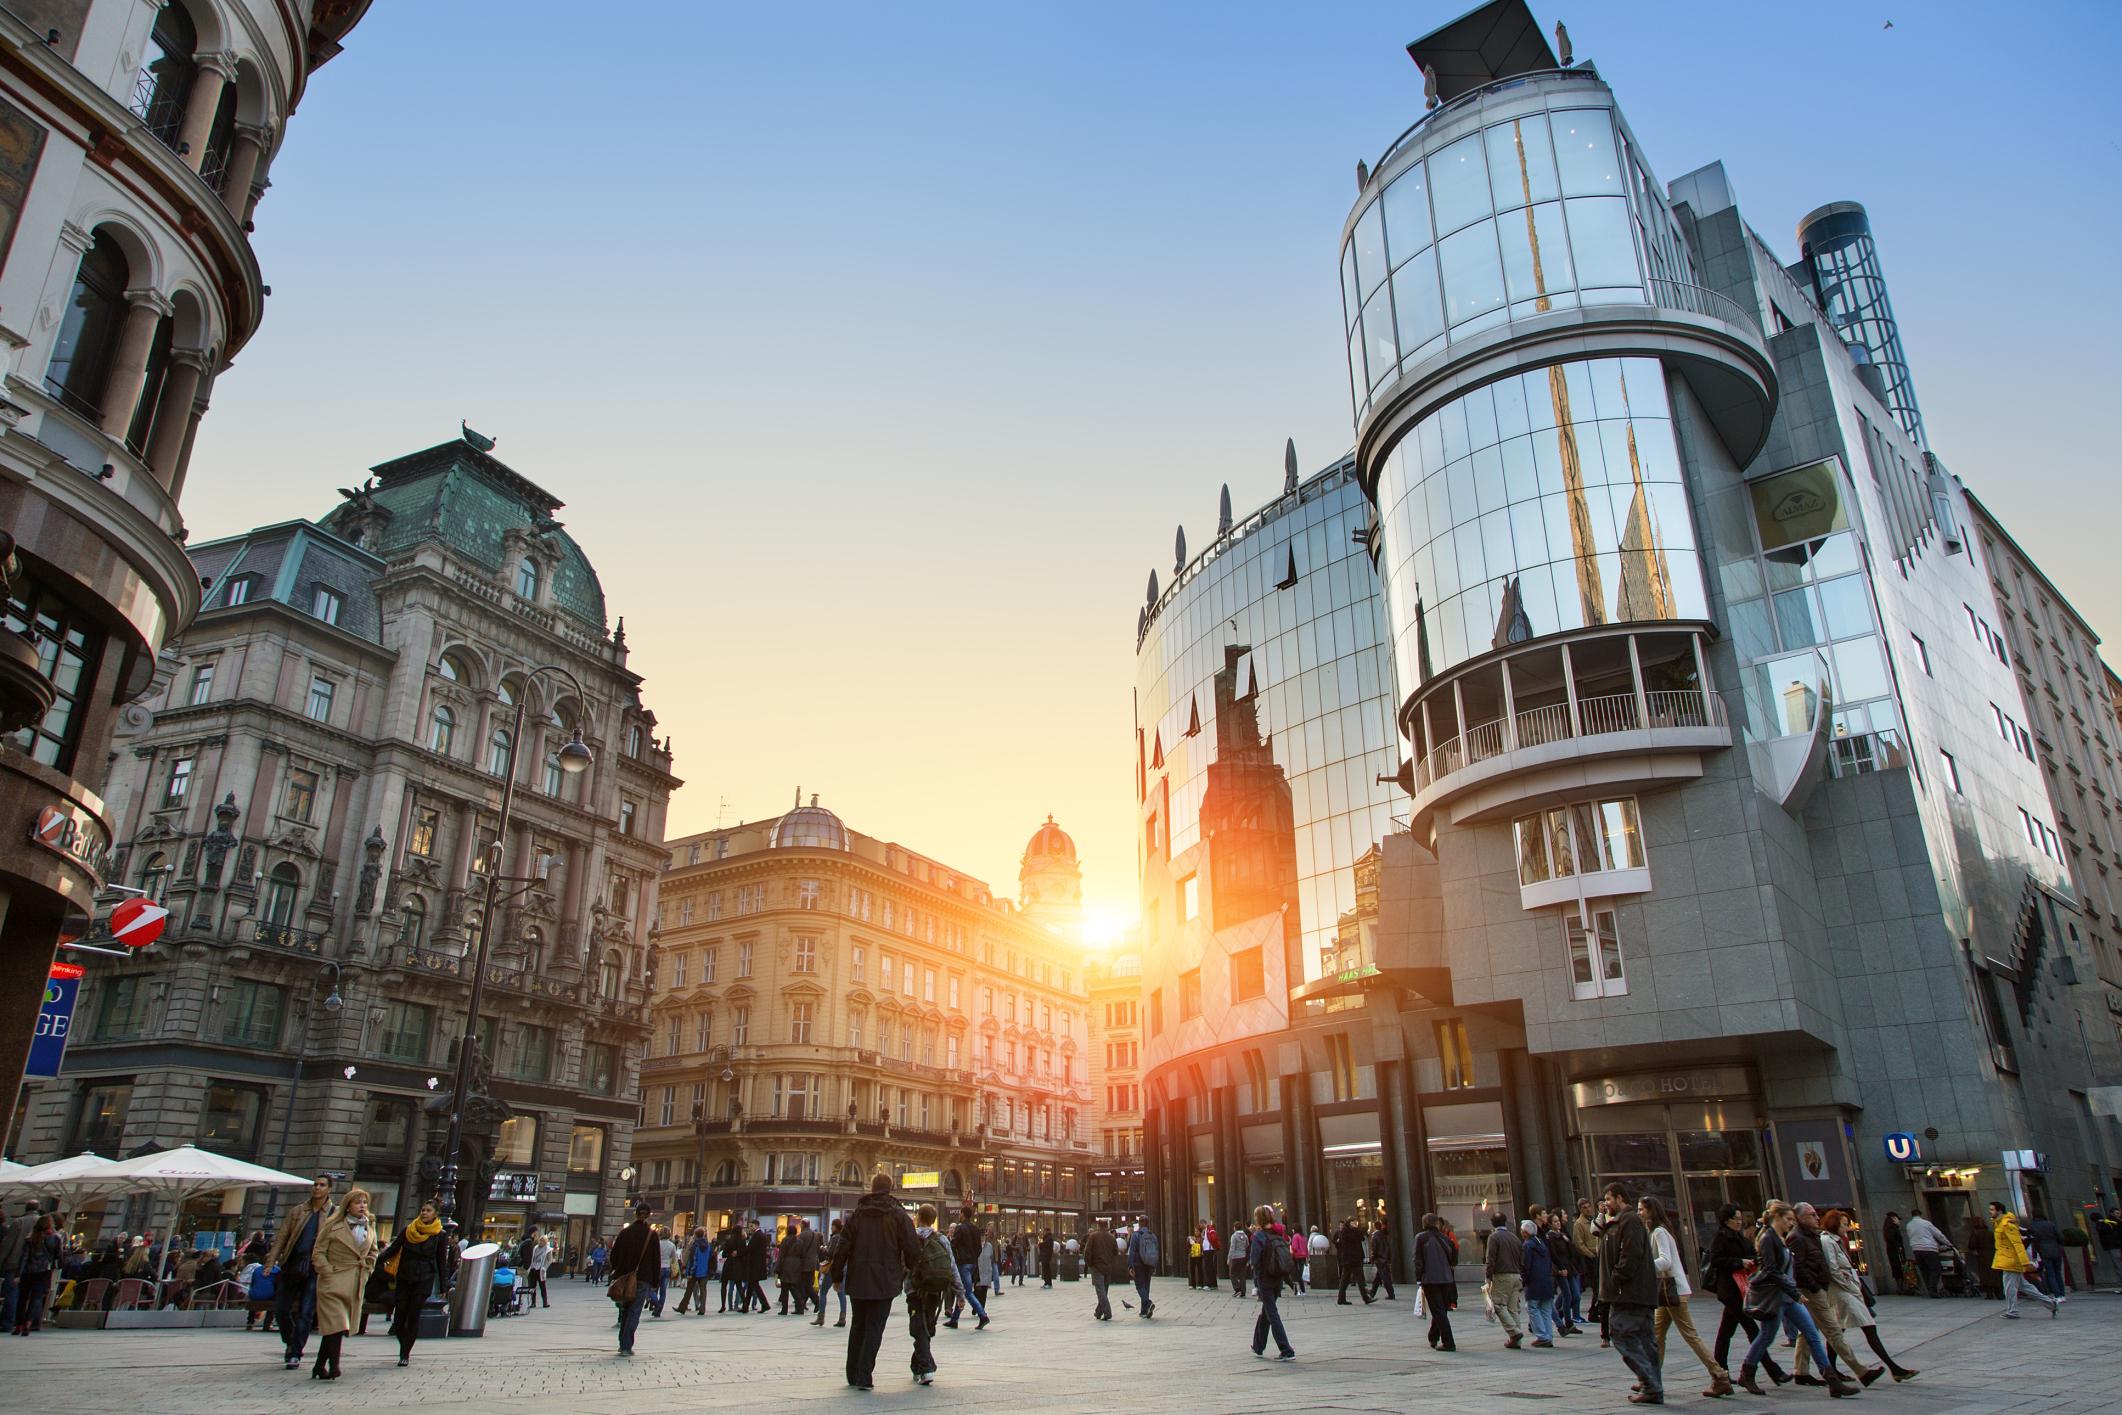 Vienna, The Stephansplatz at Sunset